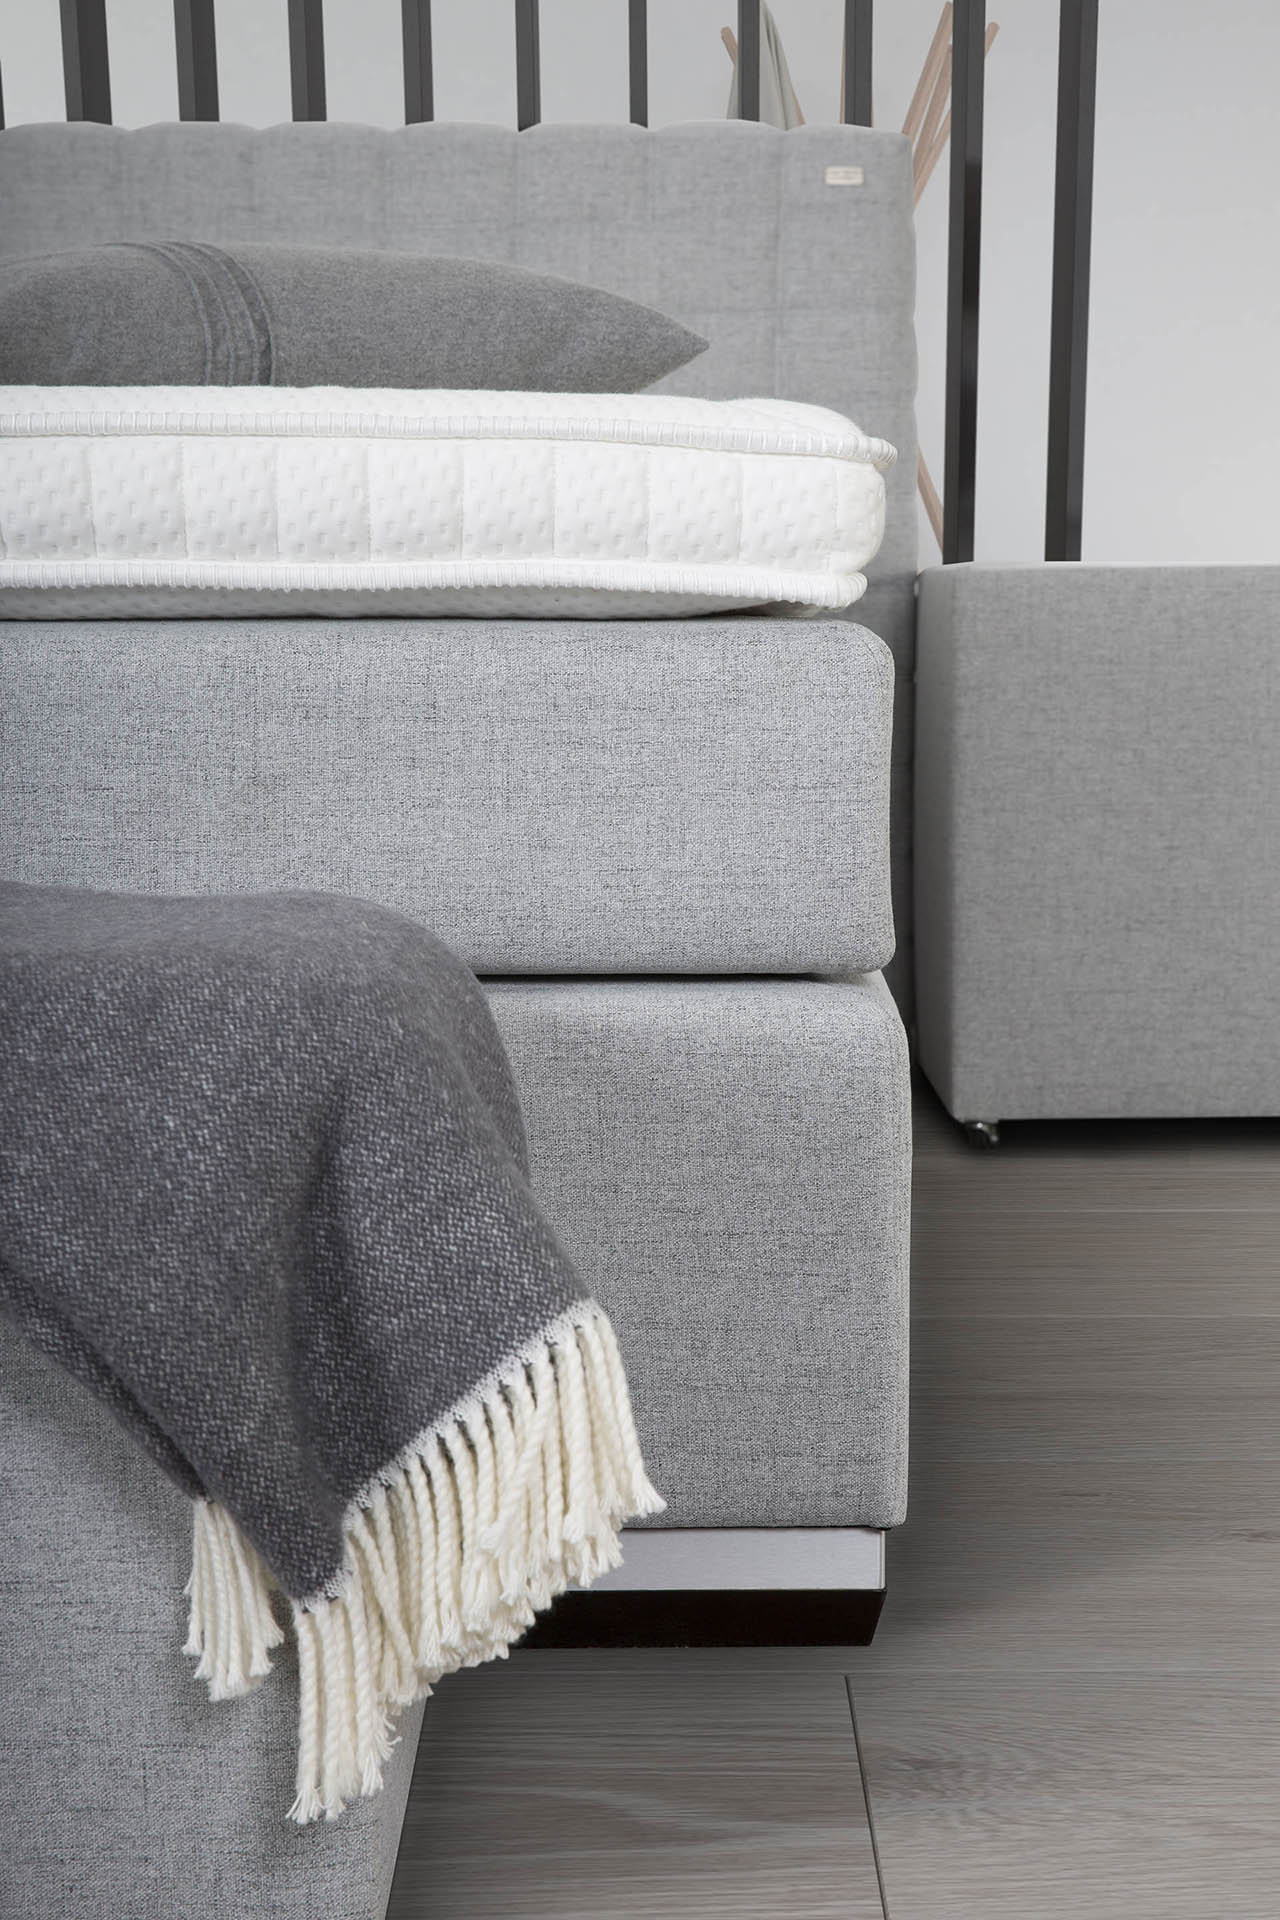 gelschaum topper gelschaum topper. Black Bedroom Furniture Sets. Home Design Ideas